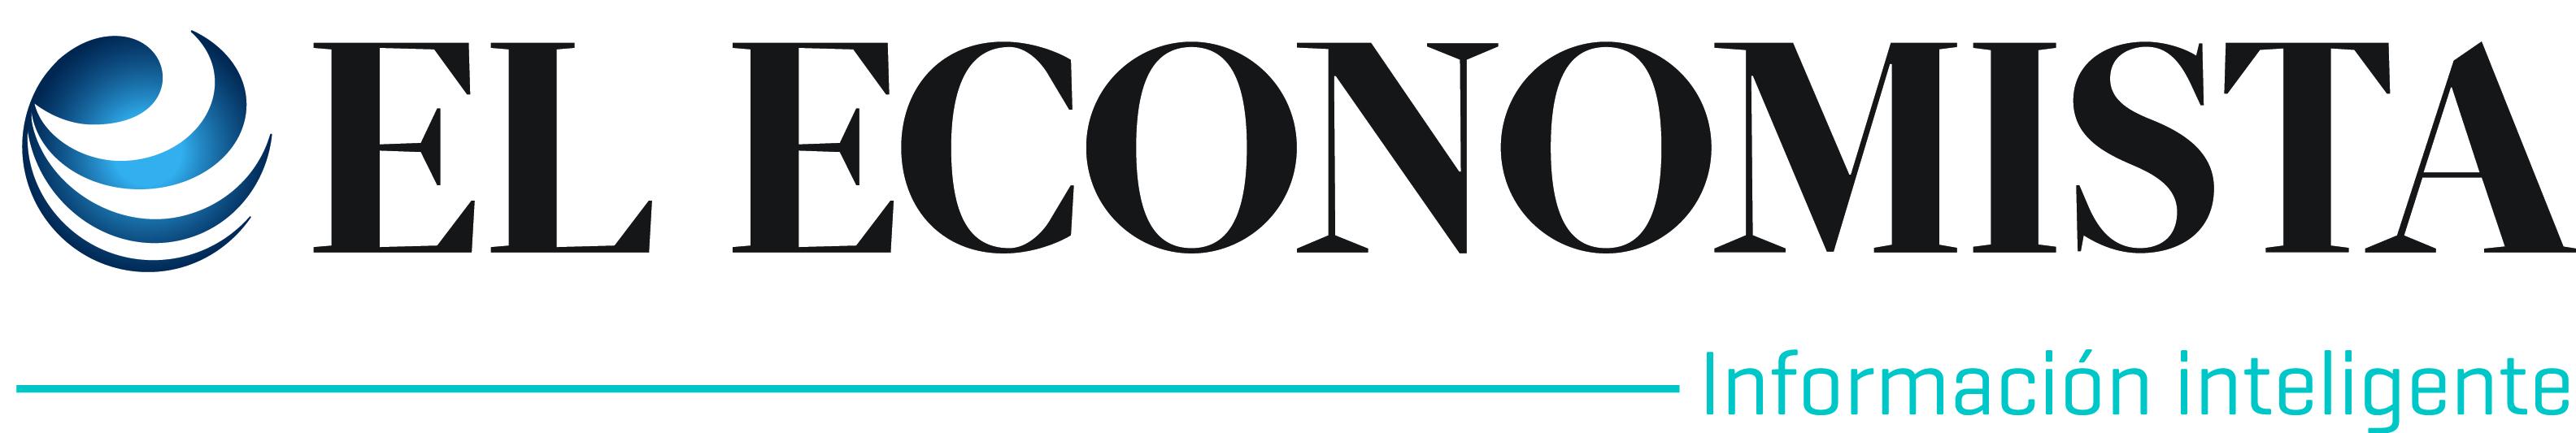 logo_horizontal html